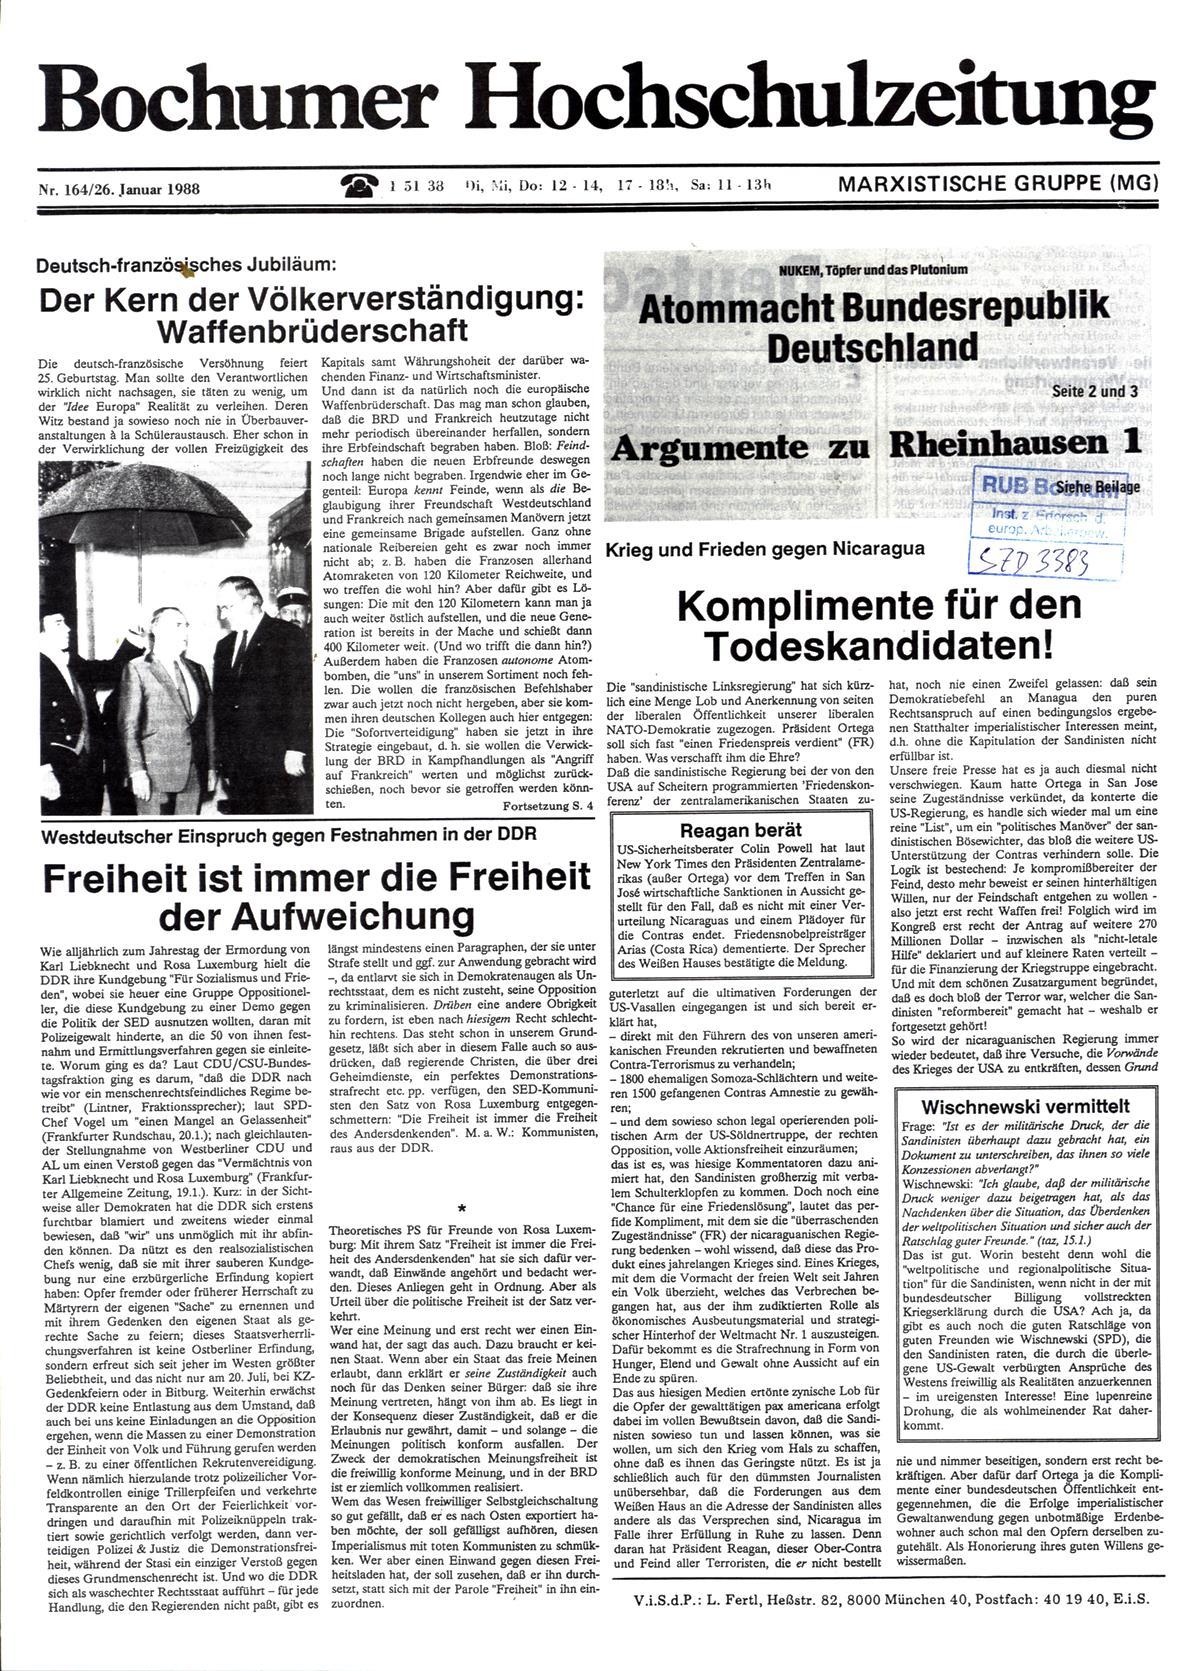 Bochum_BHZ_19880126_164_001